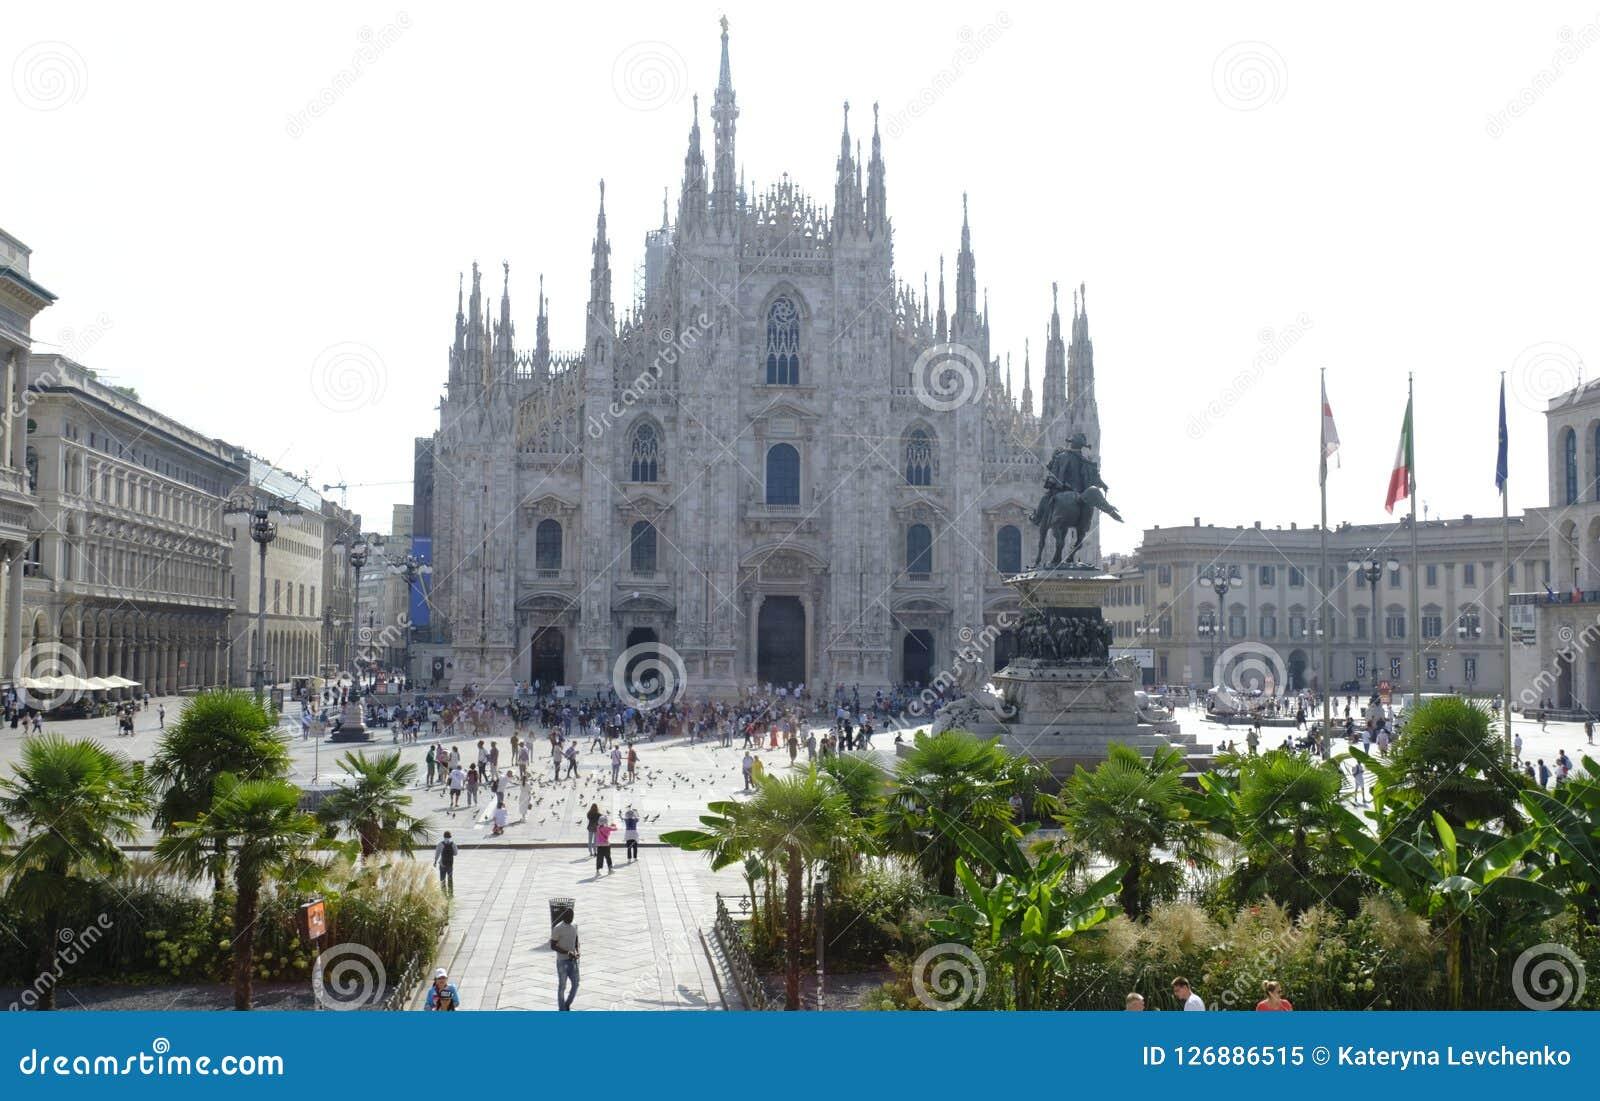 Mening van beroemd Milan Cathedral op Piazza del Duomo, Italië